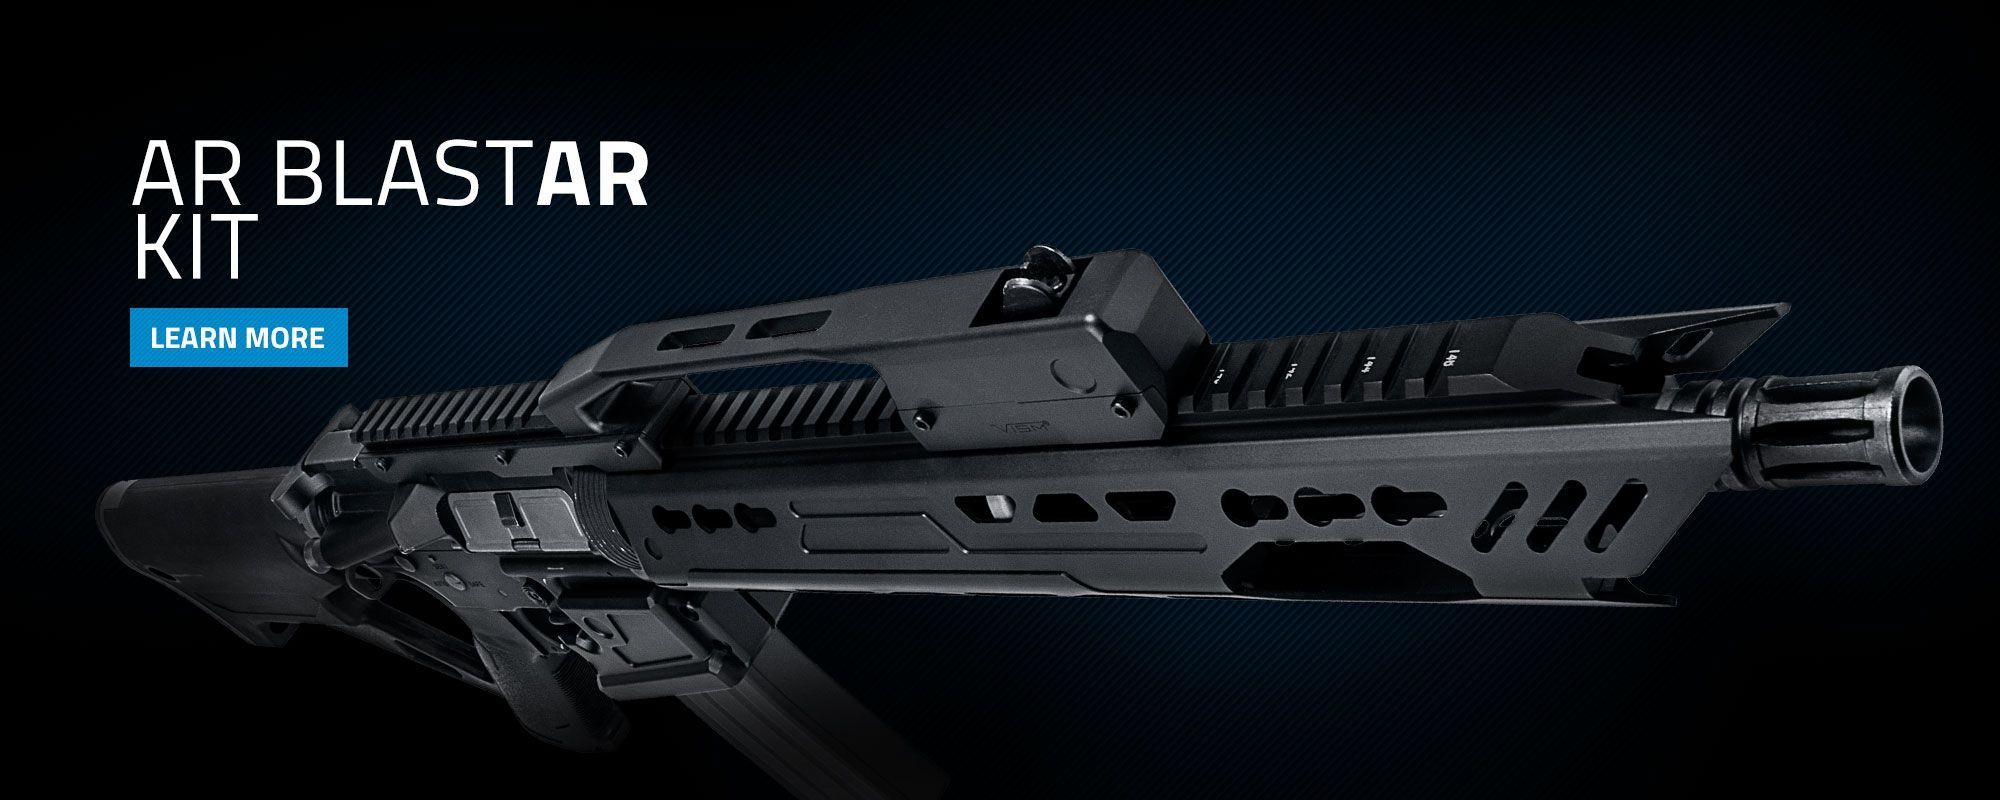 NcSTAR Inc  - Sights On Innovation™ | Firearms supply